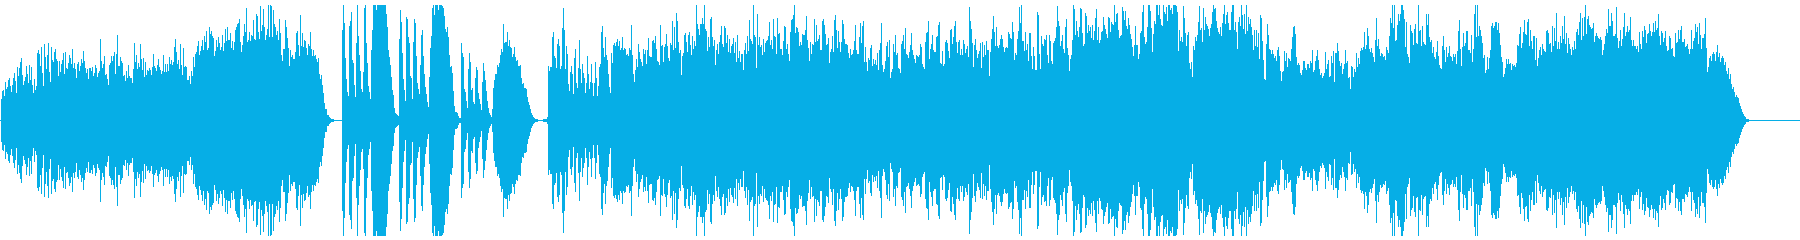 RV565_1『アレグロ』ヴィヴァルディの再生済みの波形